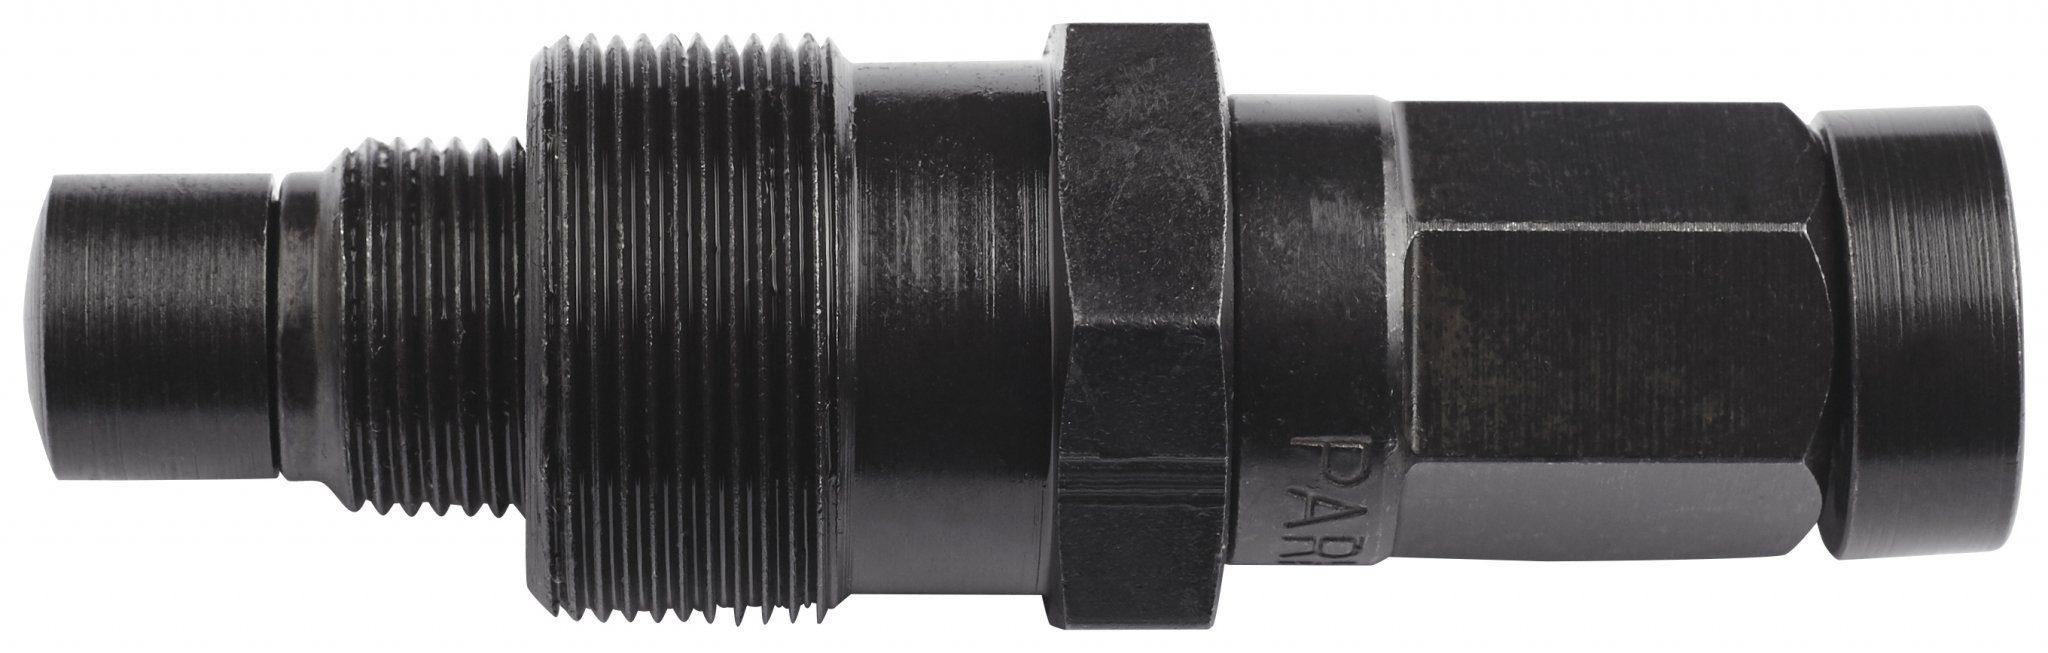 Park Tool Werkzeug & Montage »CWP-7C Kurbelabzieher«